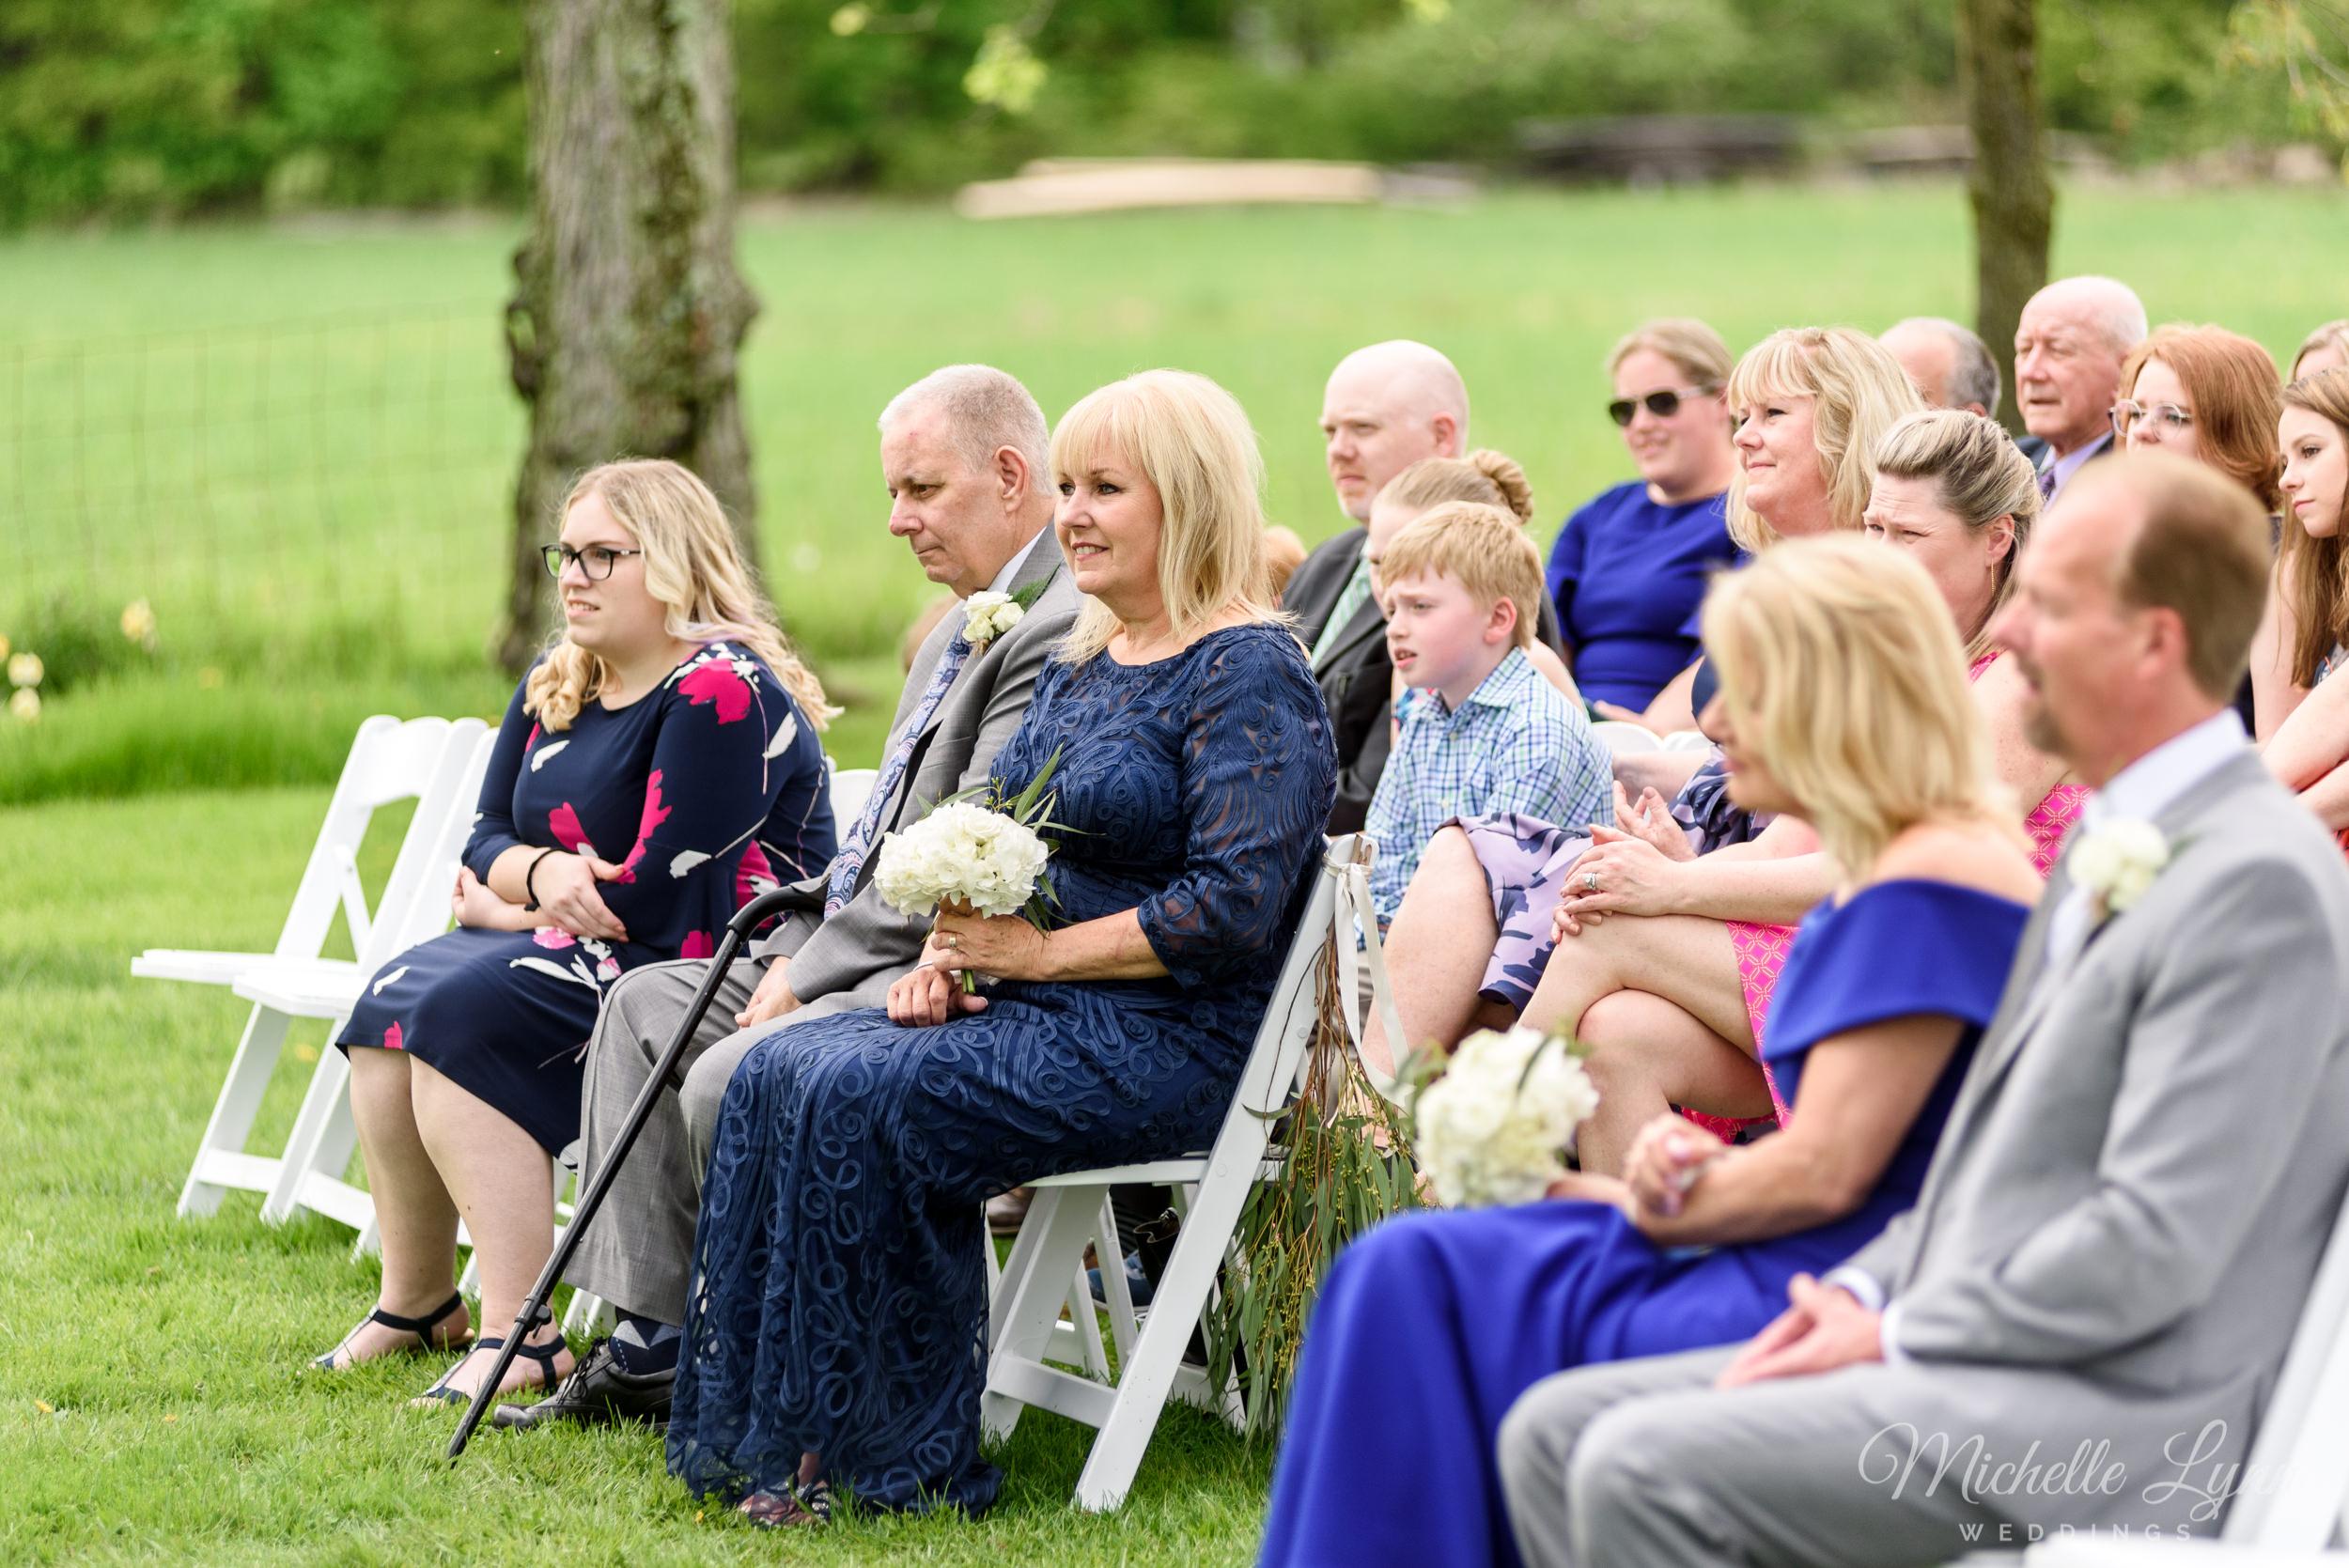 mlw-the-farm-bakery-and-events-wedding-photos-34.jpg